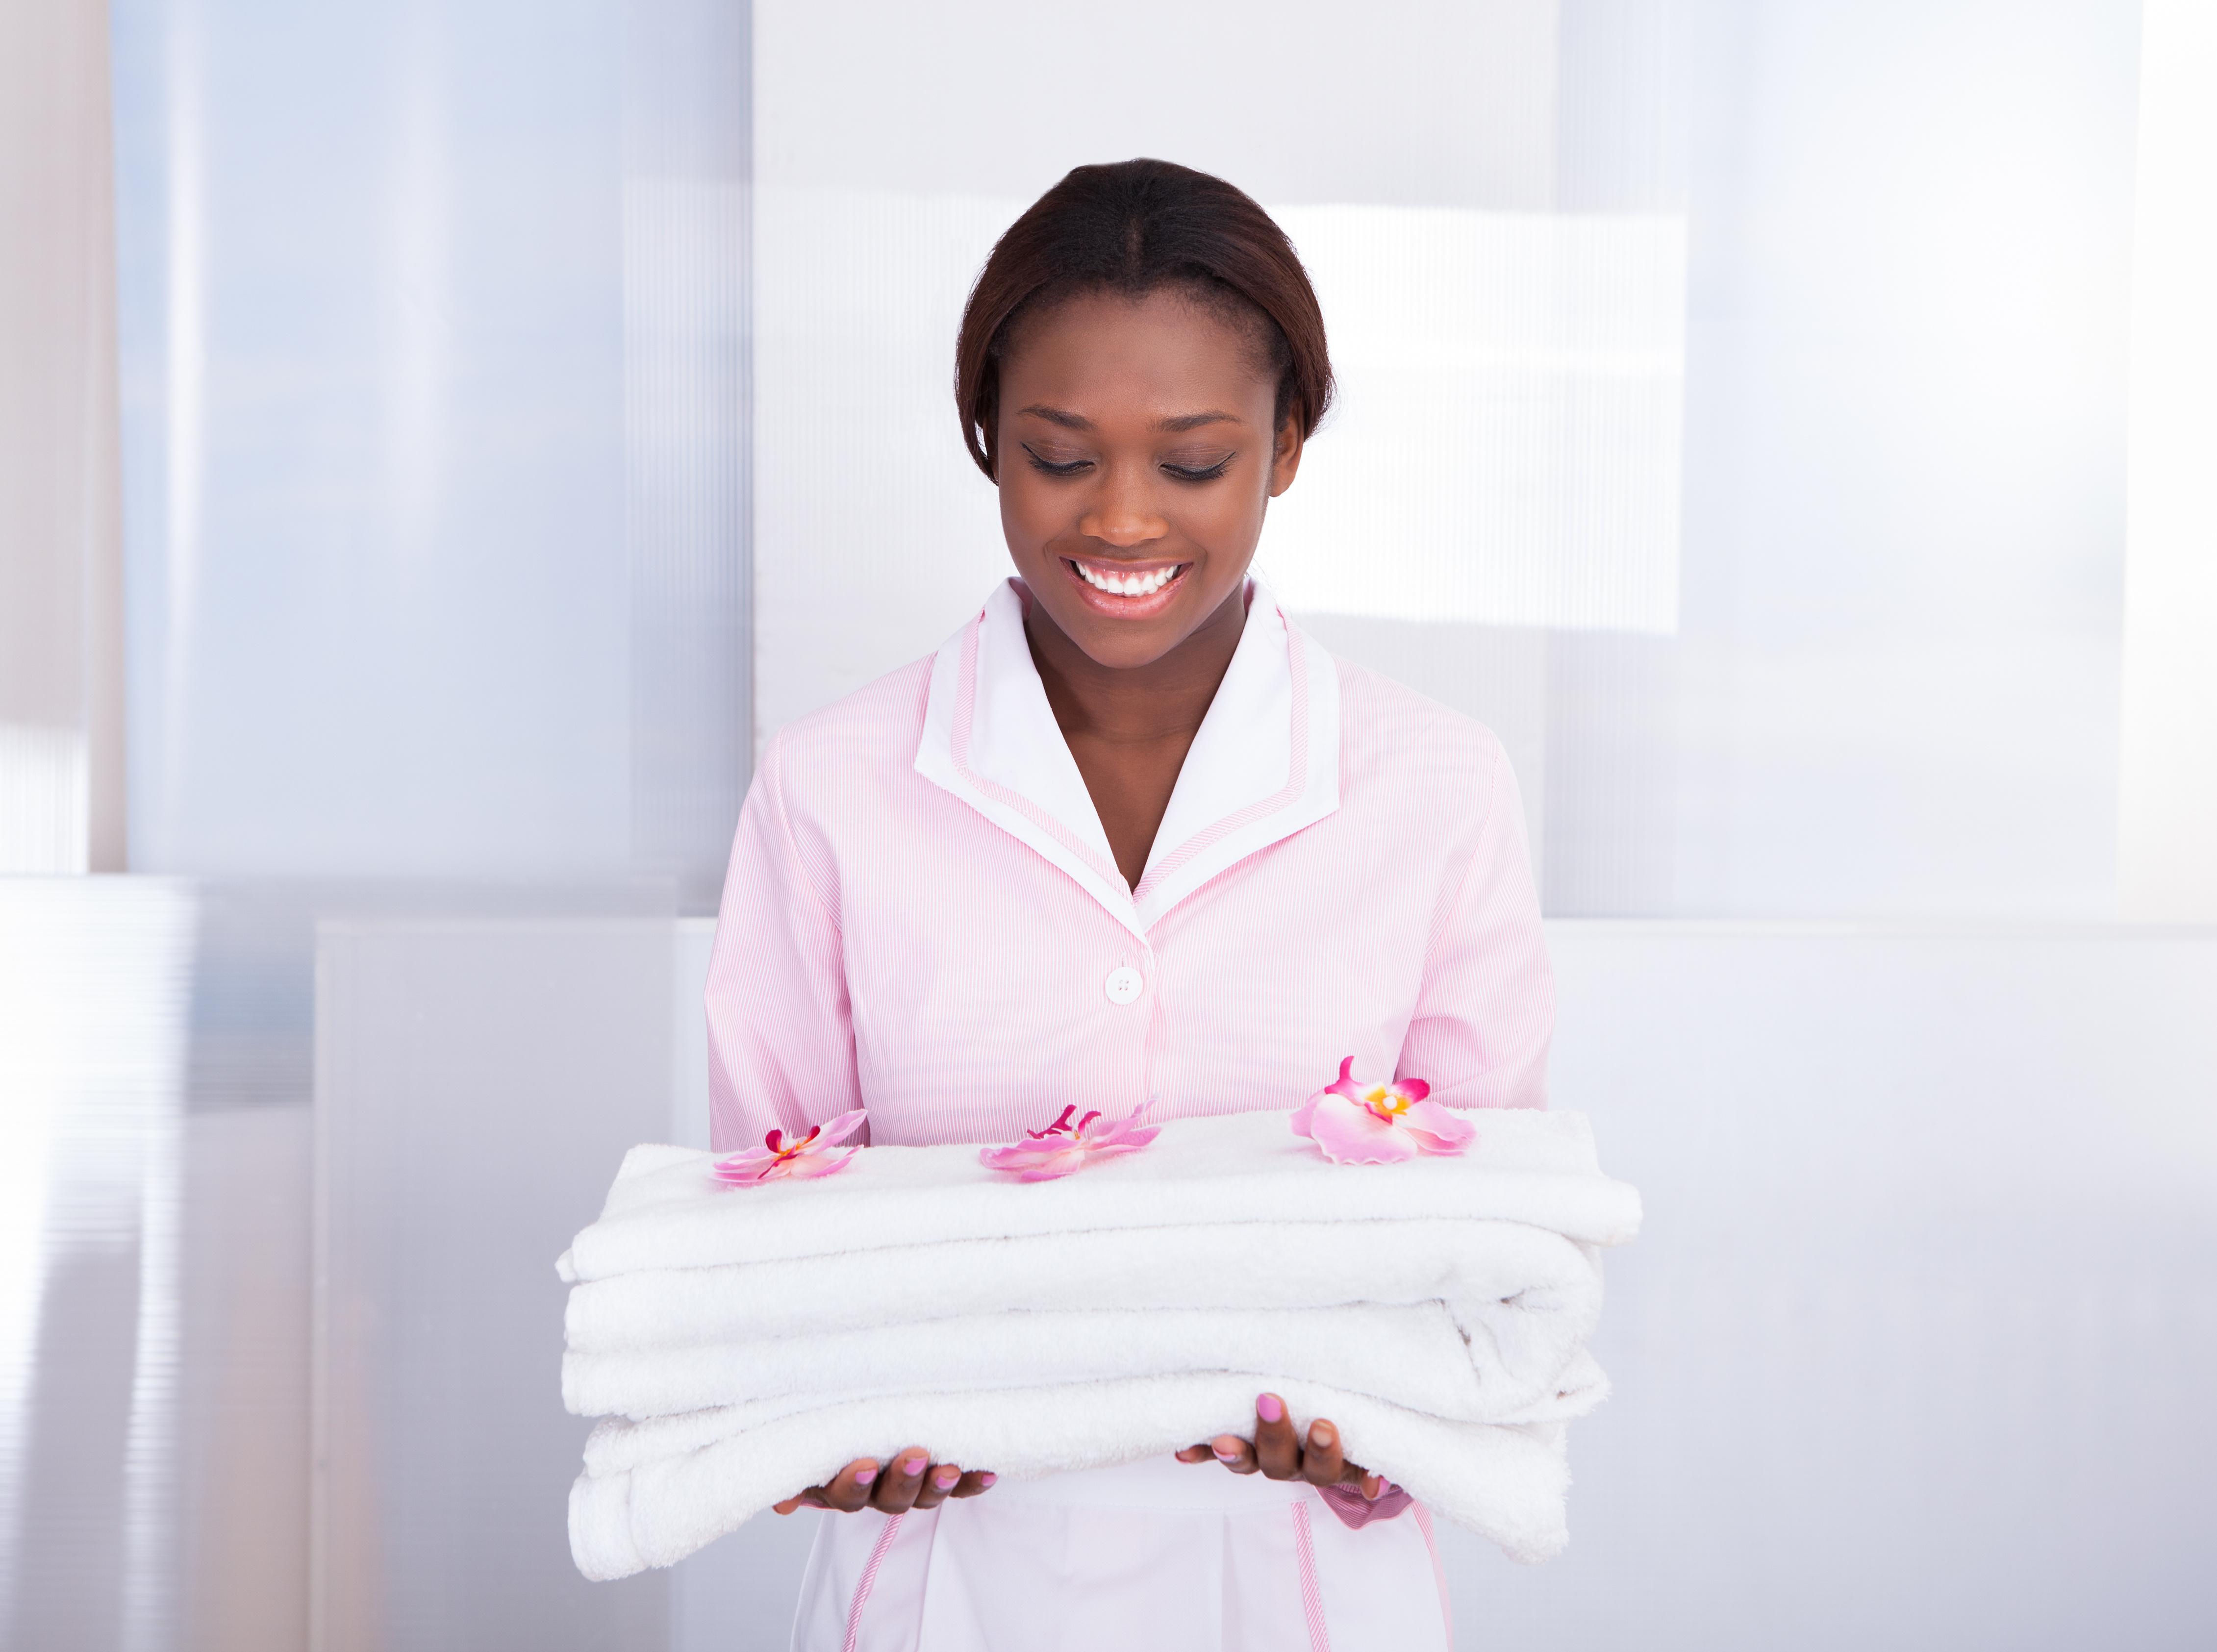 Dear future domestic worker employer